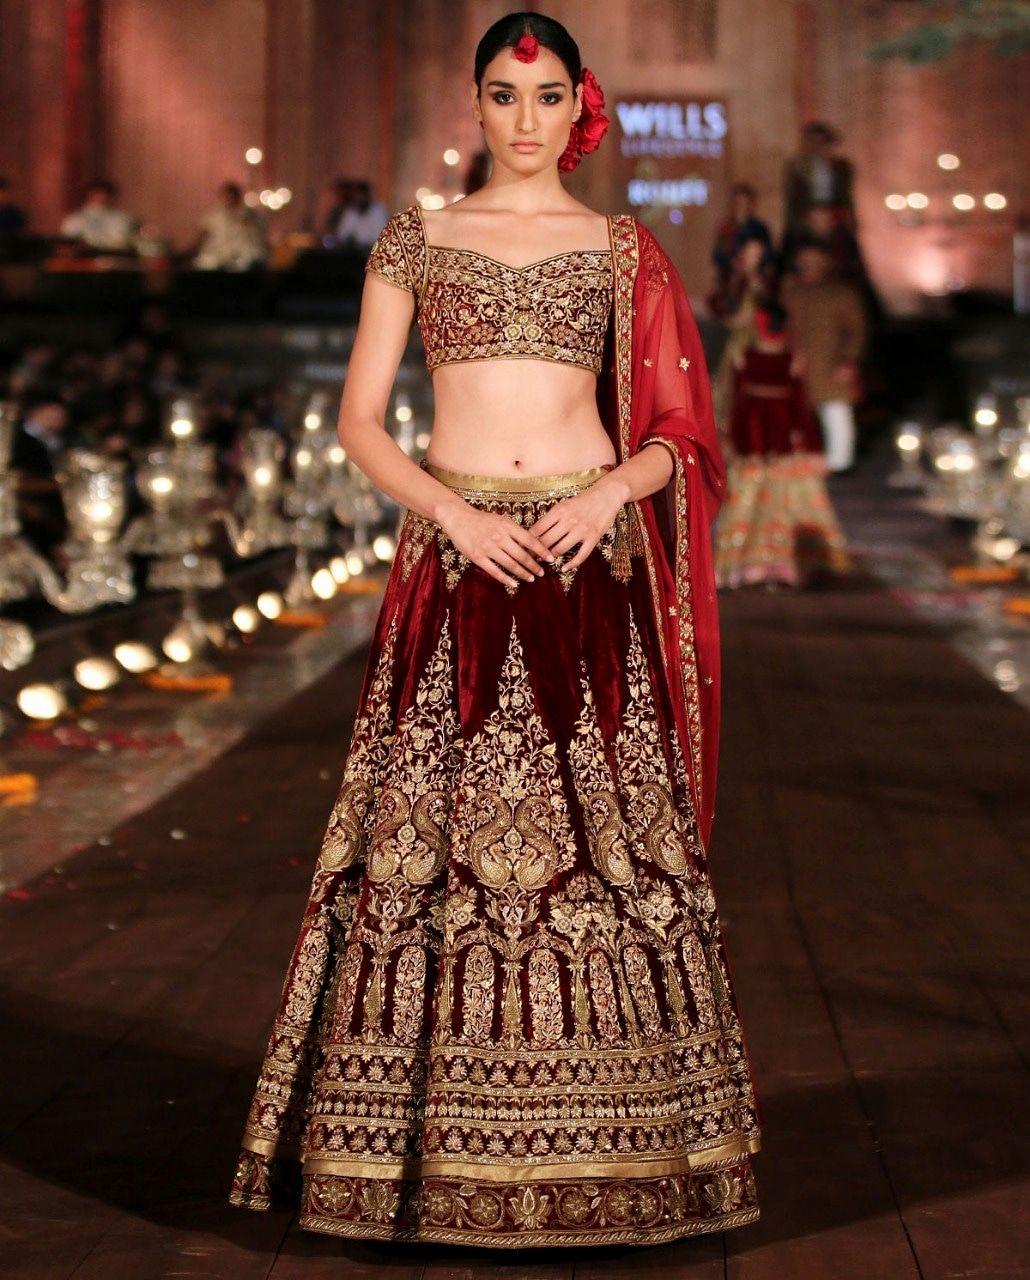 599365e858 WEDDING WEAR DESIGNER GARNET MAROON COLOUR BRIDAL LEHENGA Price: 4200 INR  /- To